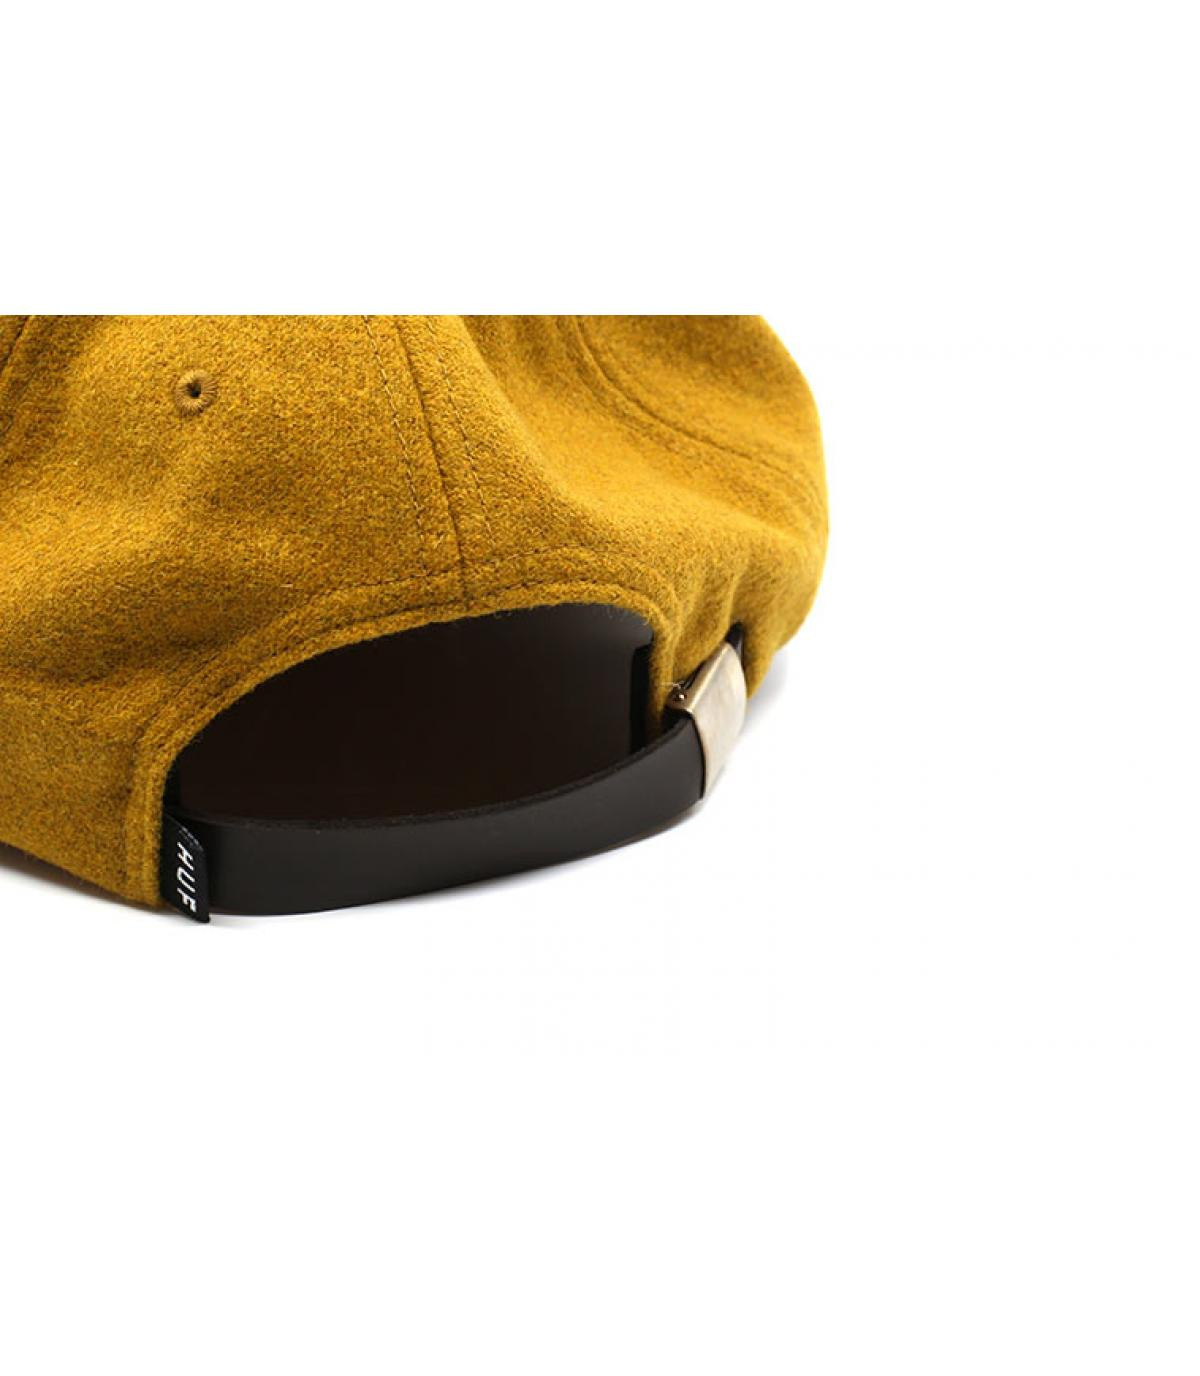 Détails Wool Box Logo mustard - image 5